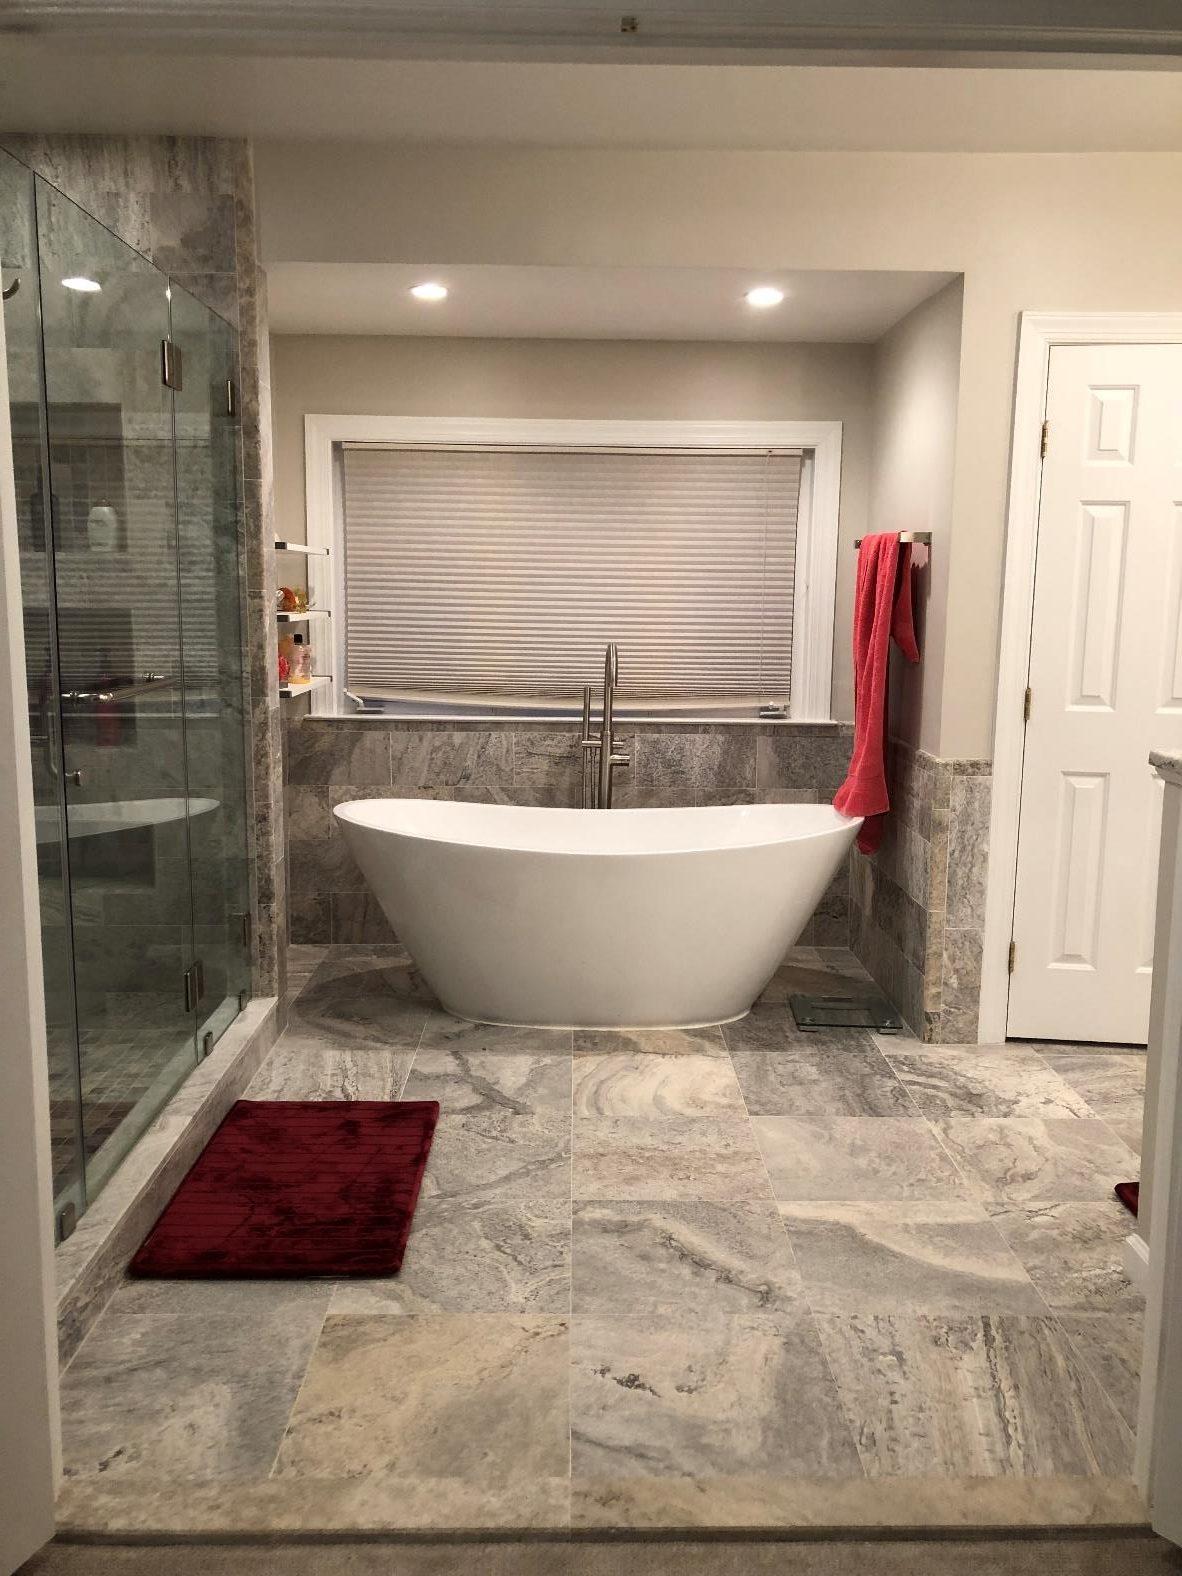 Modern bathroom setup with shower room and freestanding bath tub